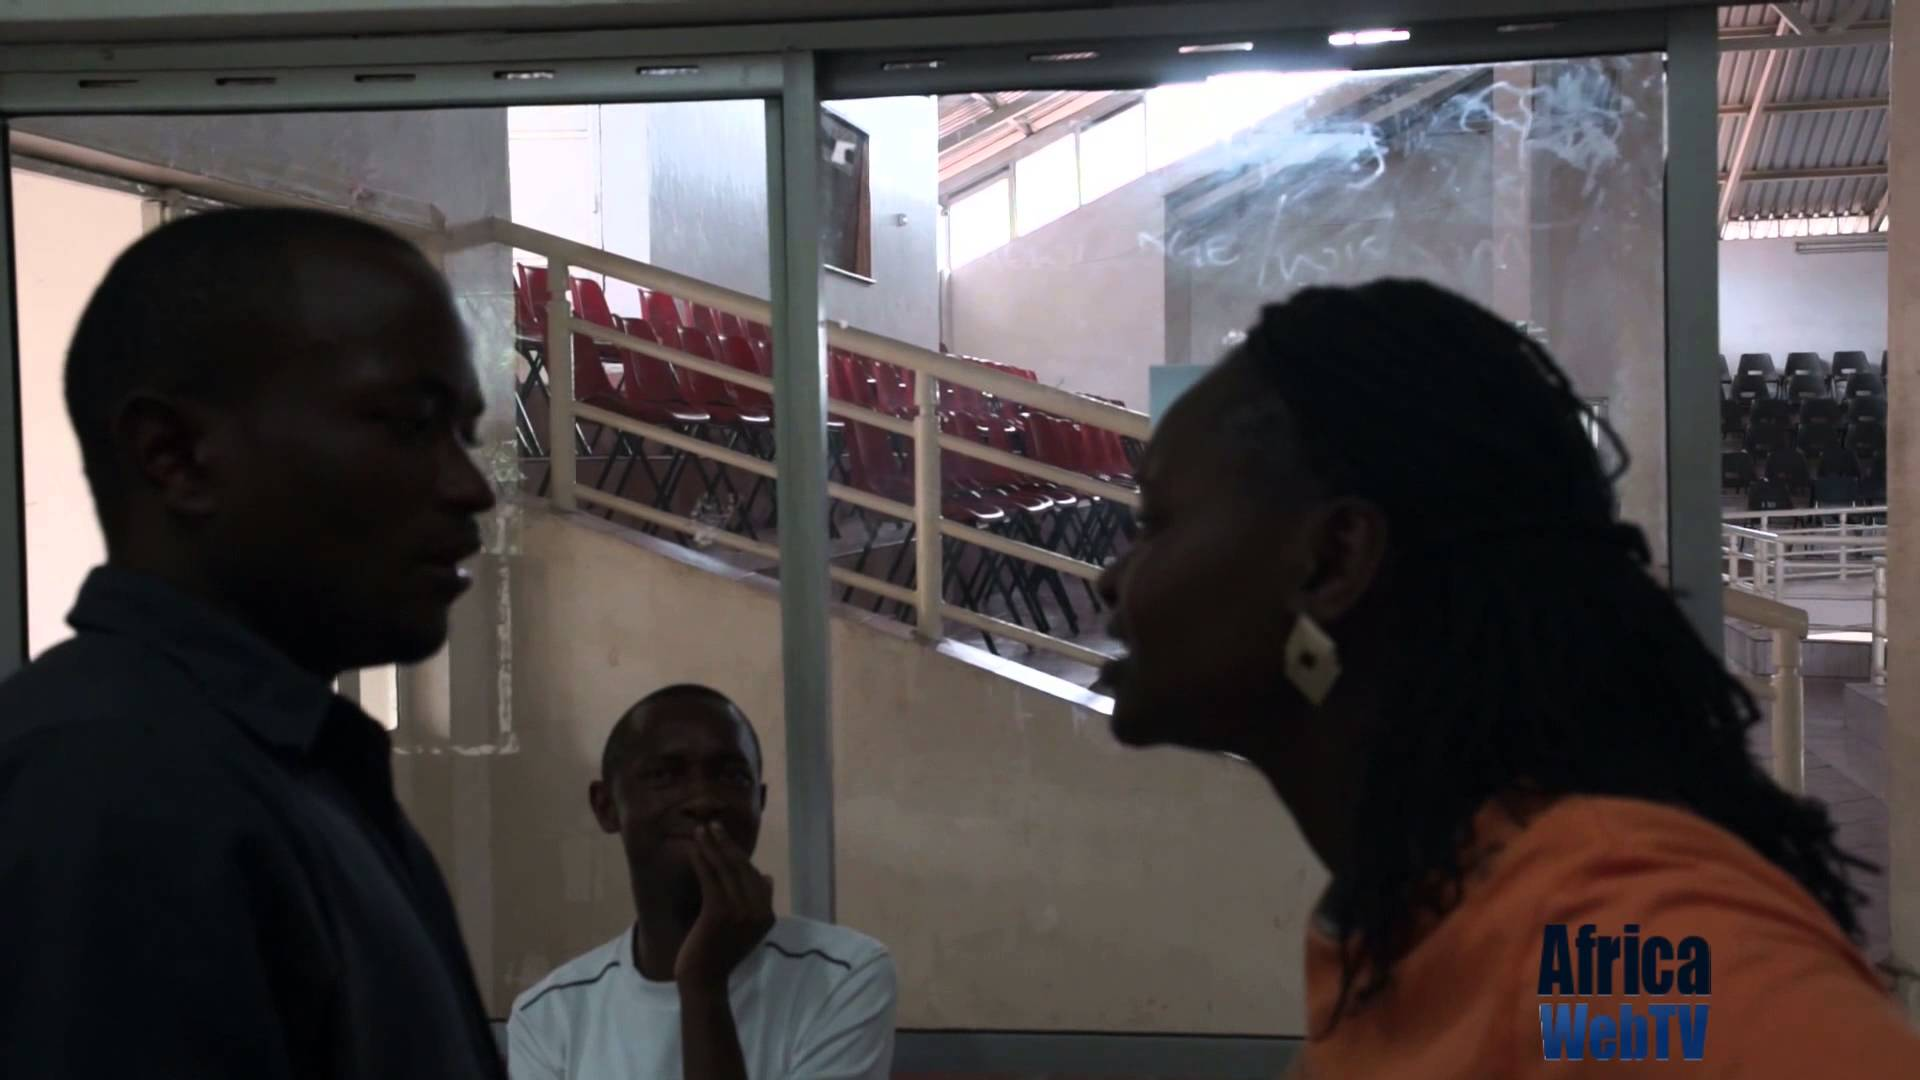 At the rehearsal of Rufus the play (Kenya 2014)